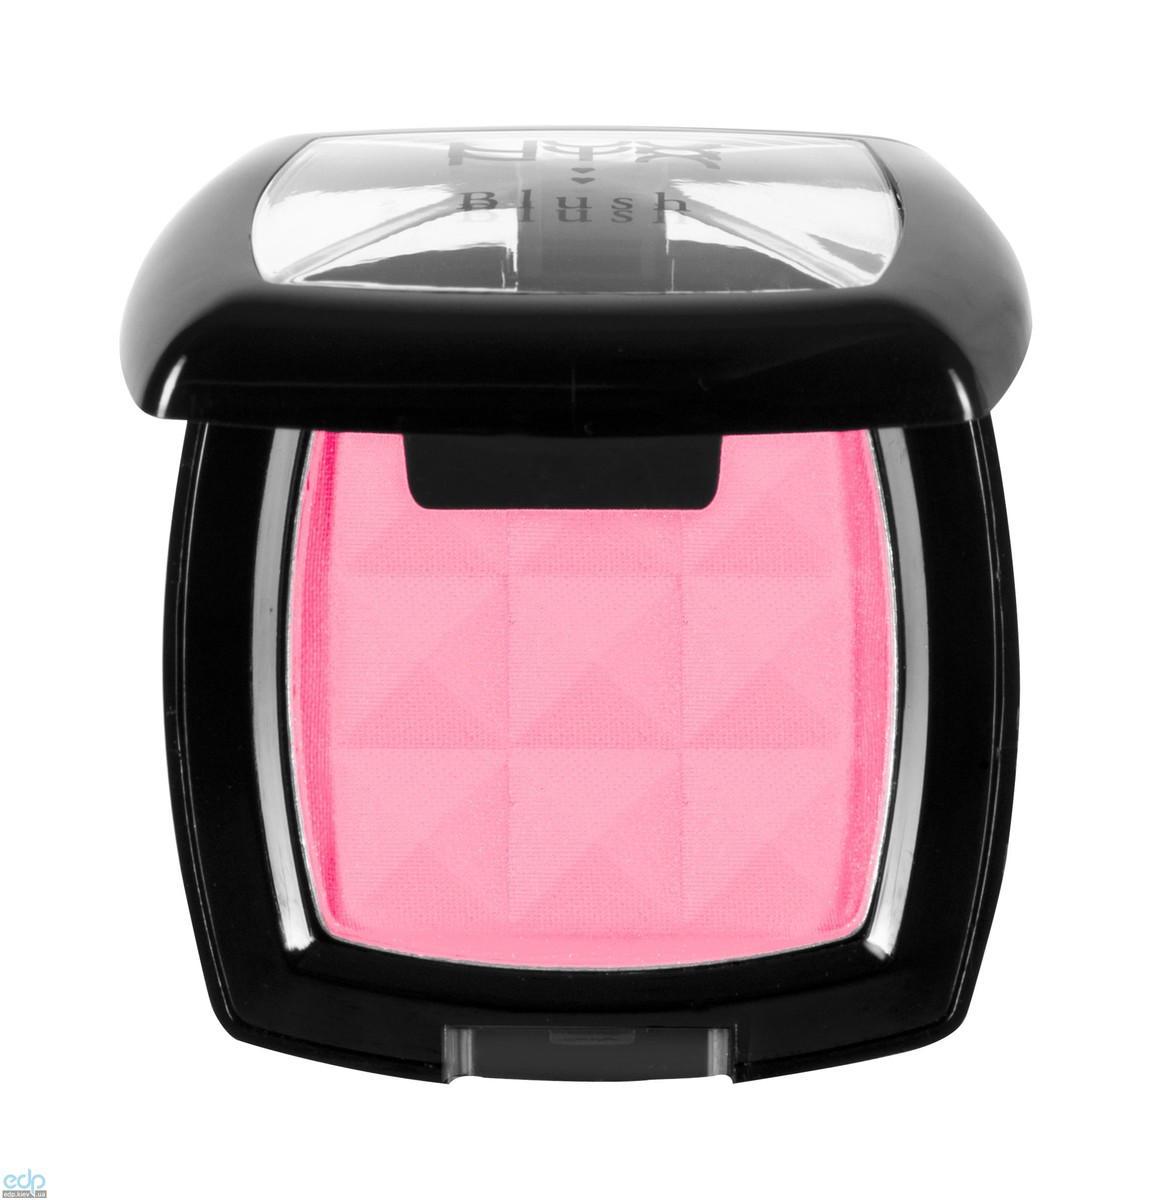 NYX - Компактные румяна Nyx Powder Blush холодный розовый Flamingo PB30 - 4 g